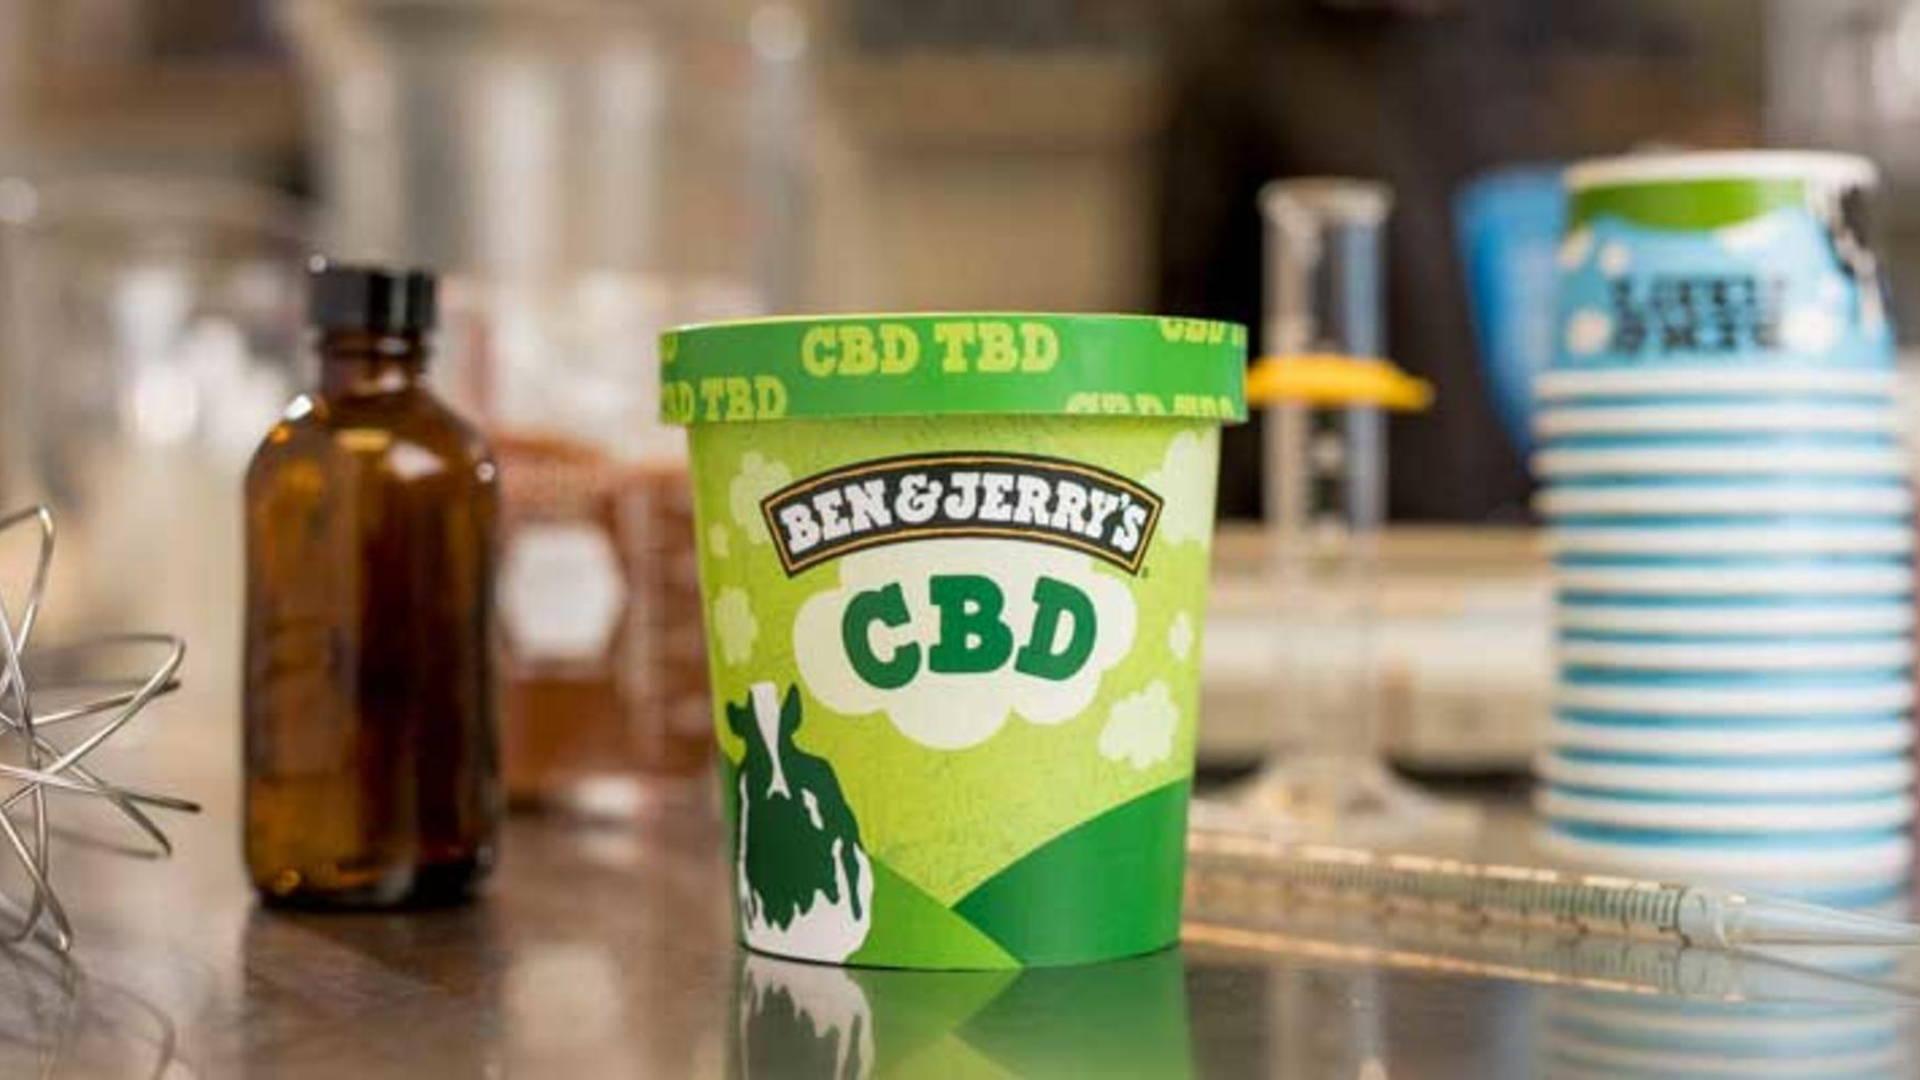 Ben & Jerry's To Release CBD Ice Cream Pending FDA Approval